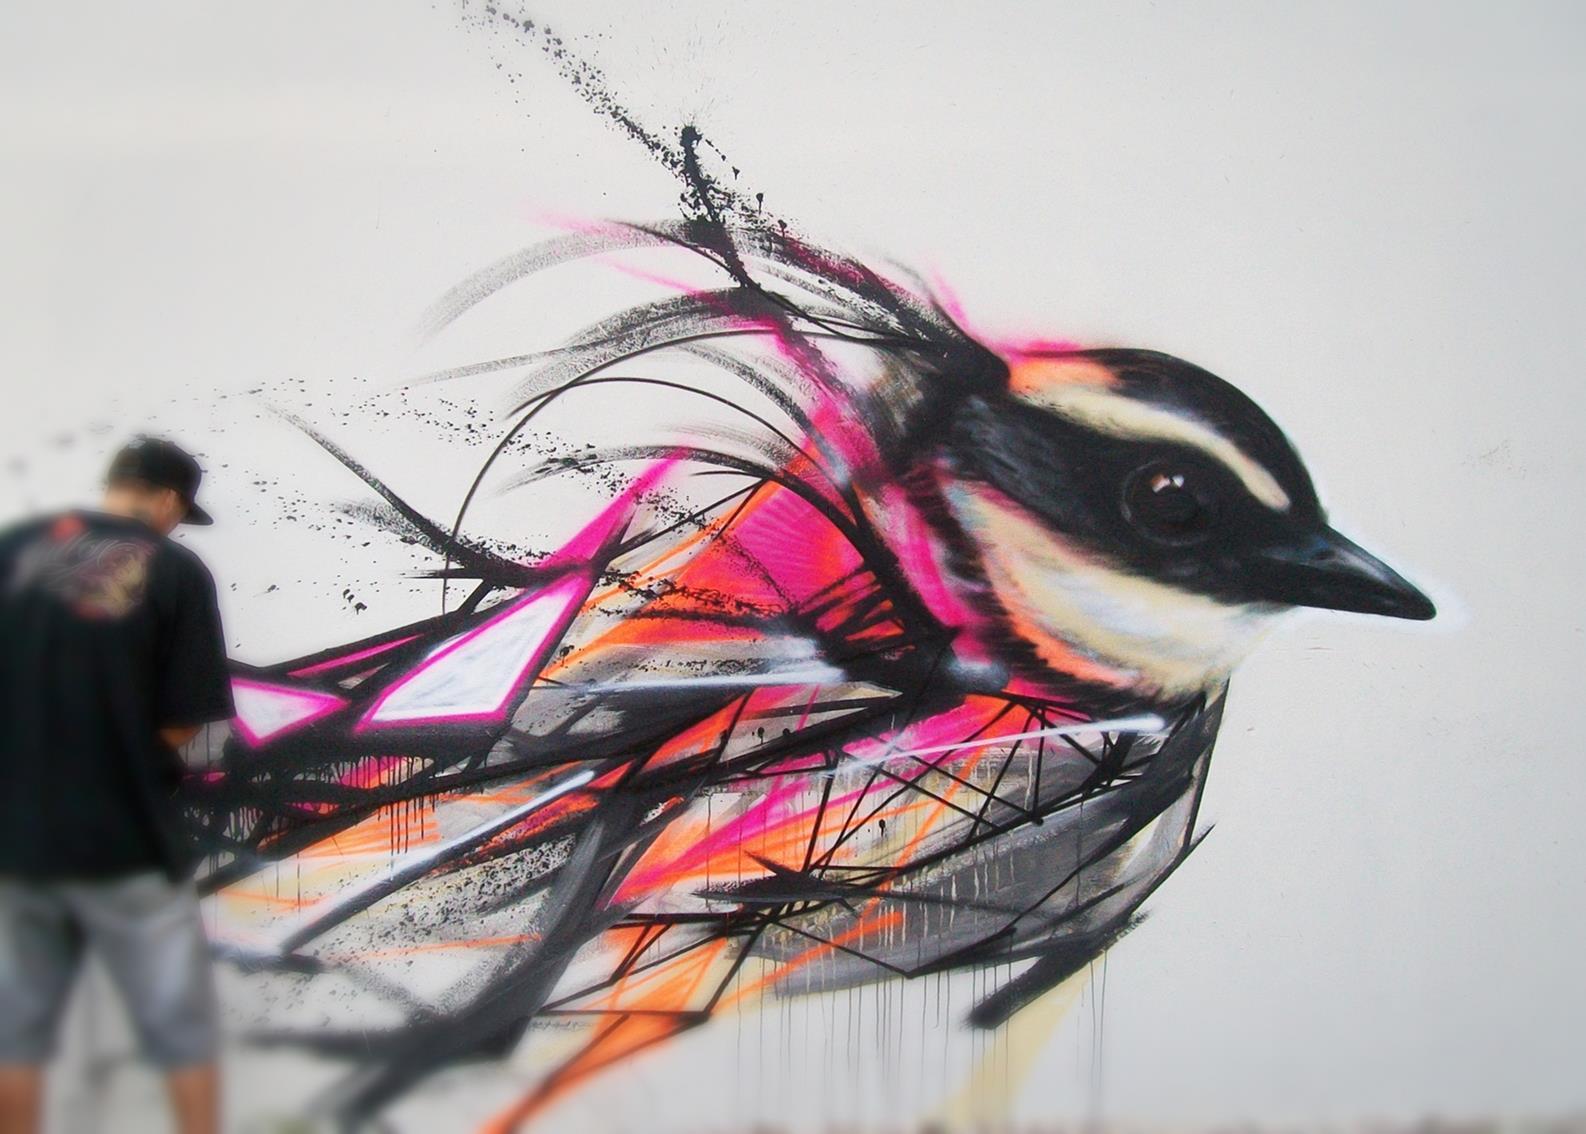 Graffiti Birds by Brazilian Artist L7M | inspirationfeed.com